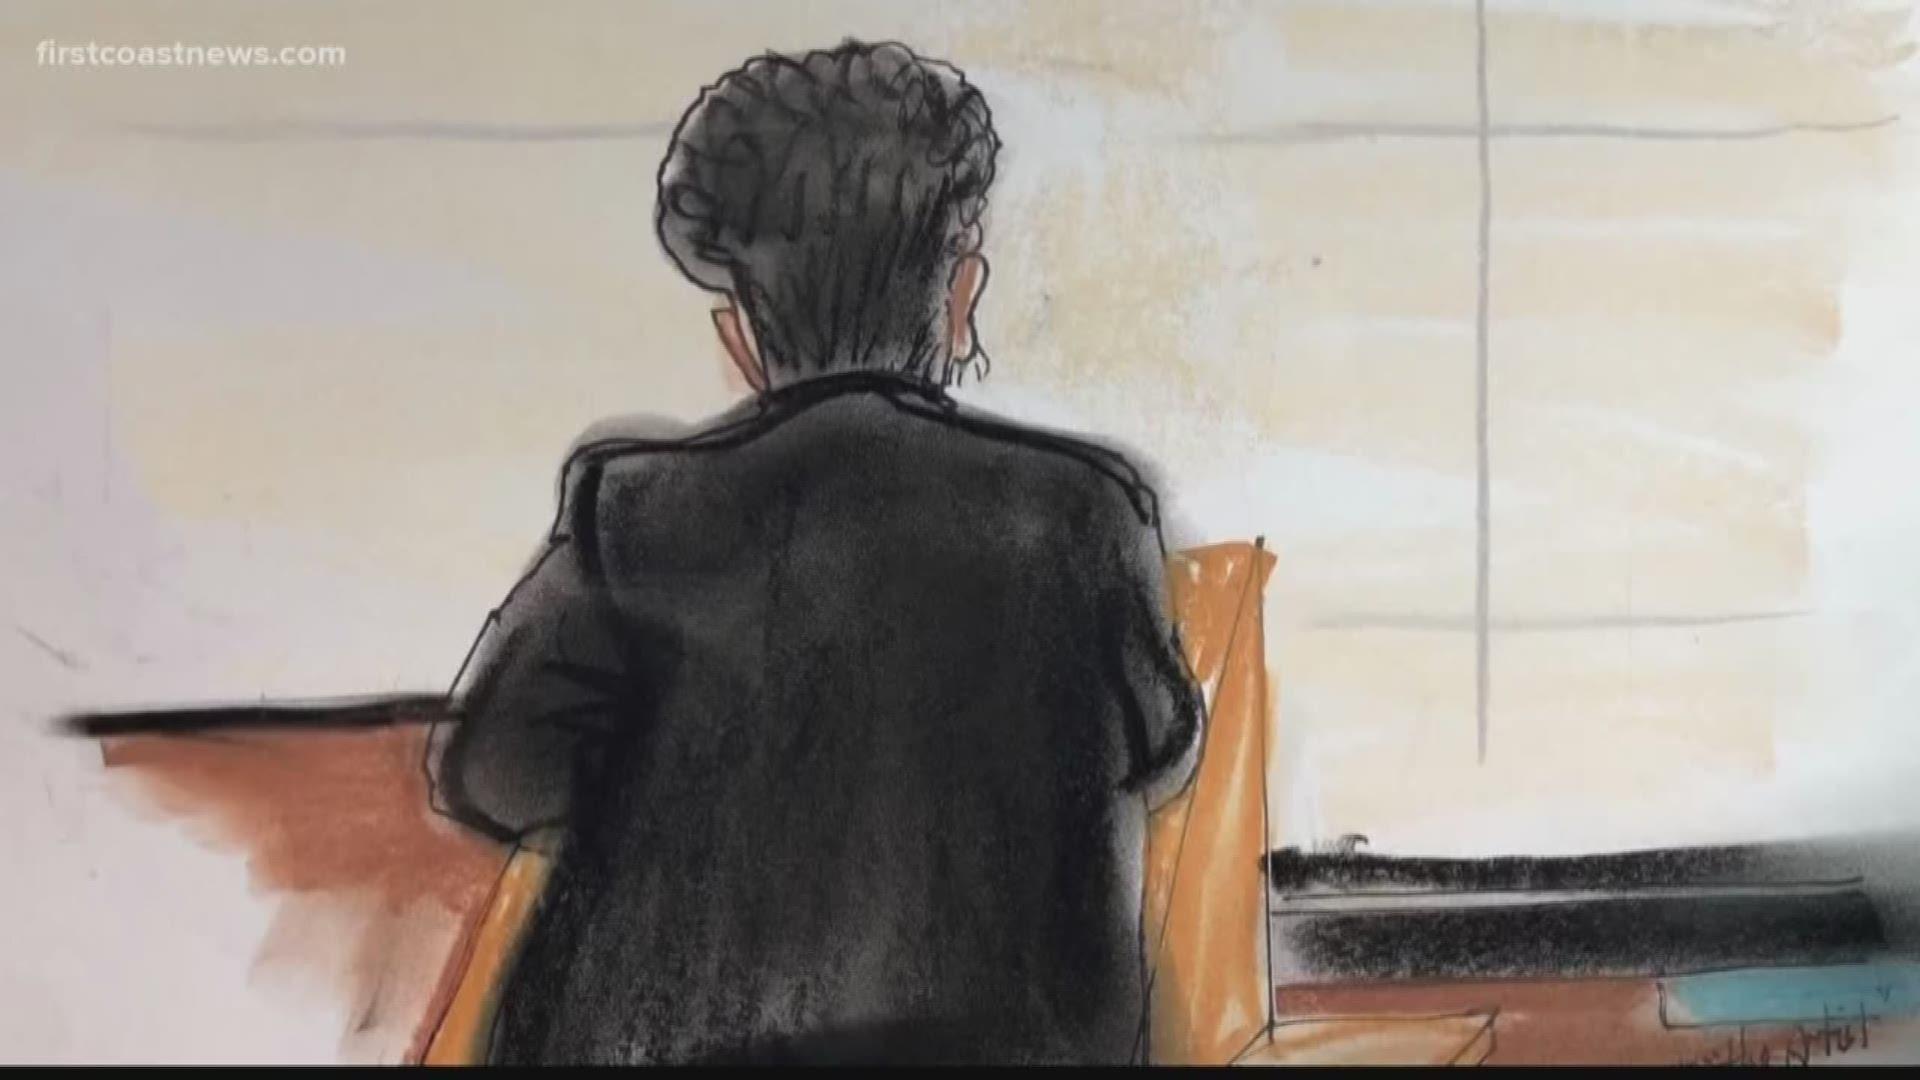 UPDATE: Jury reaches verdict in case against Katrina Brown, Reginald Brown  | firstcoastnews.com